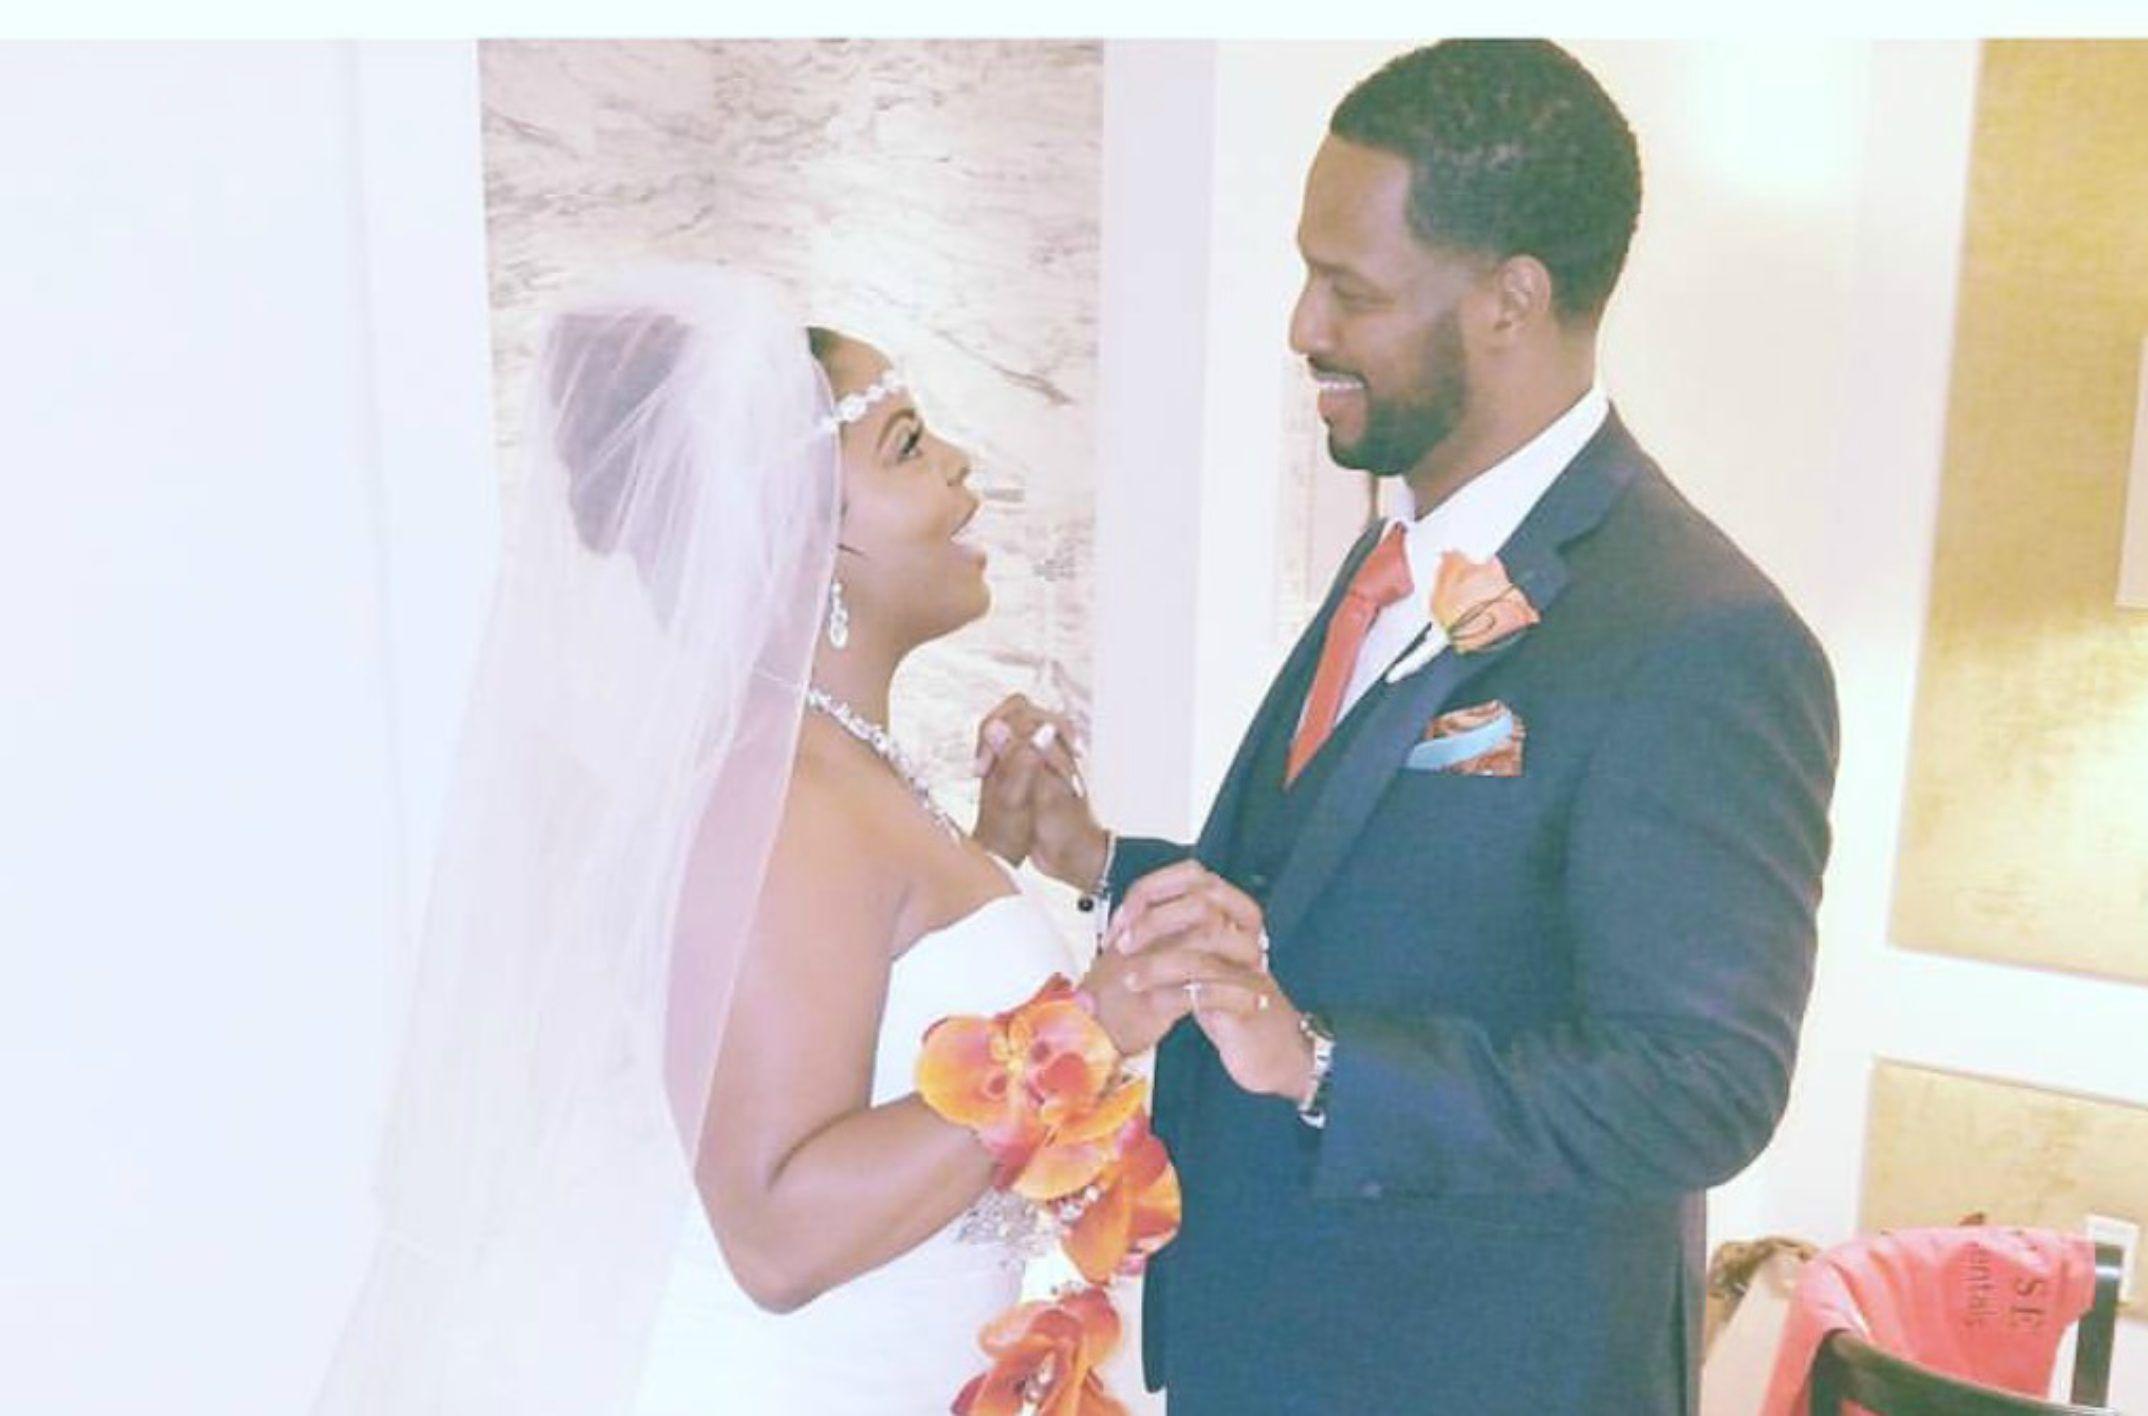 brely evans husband